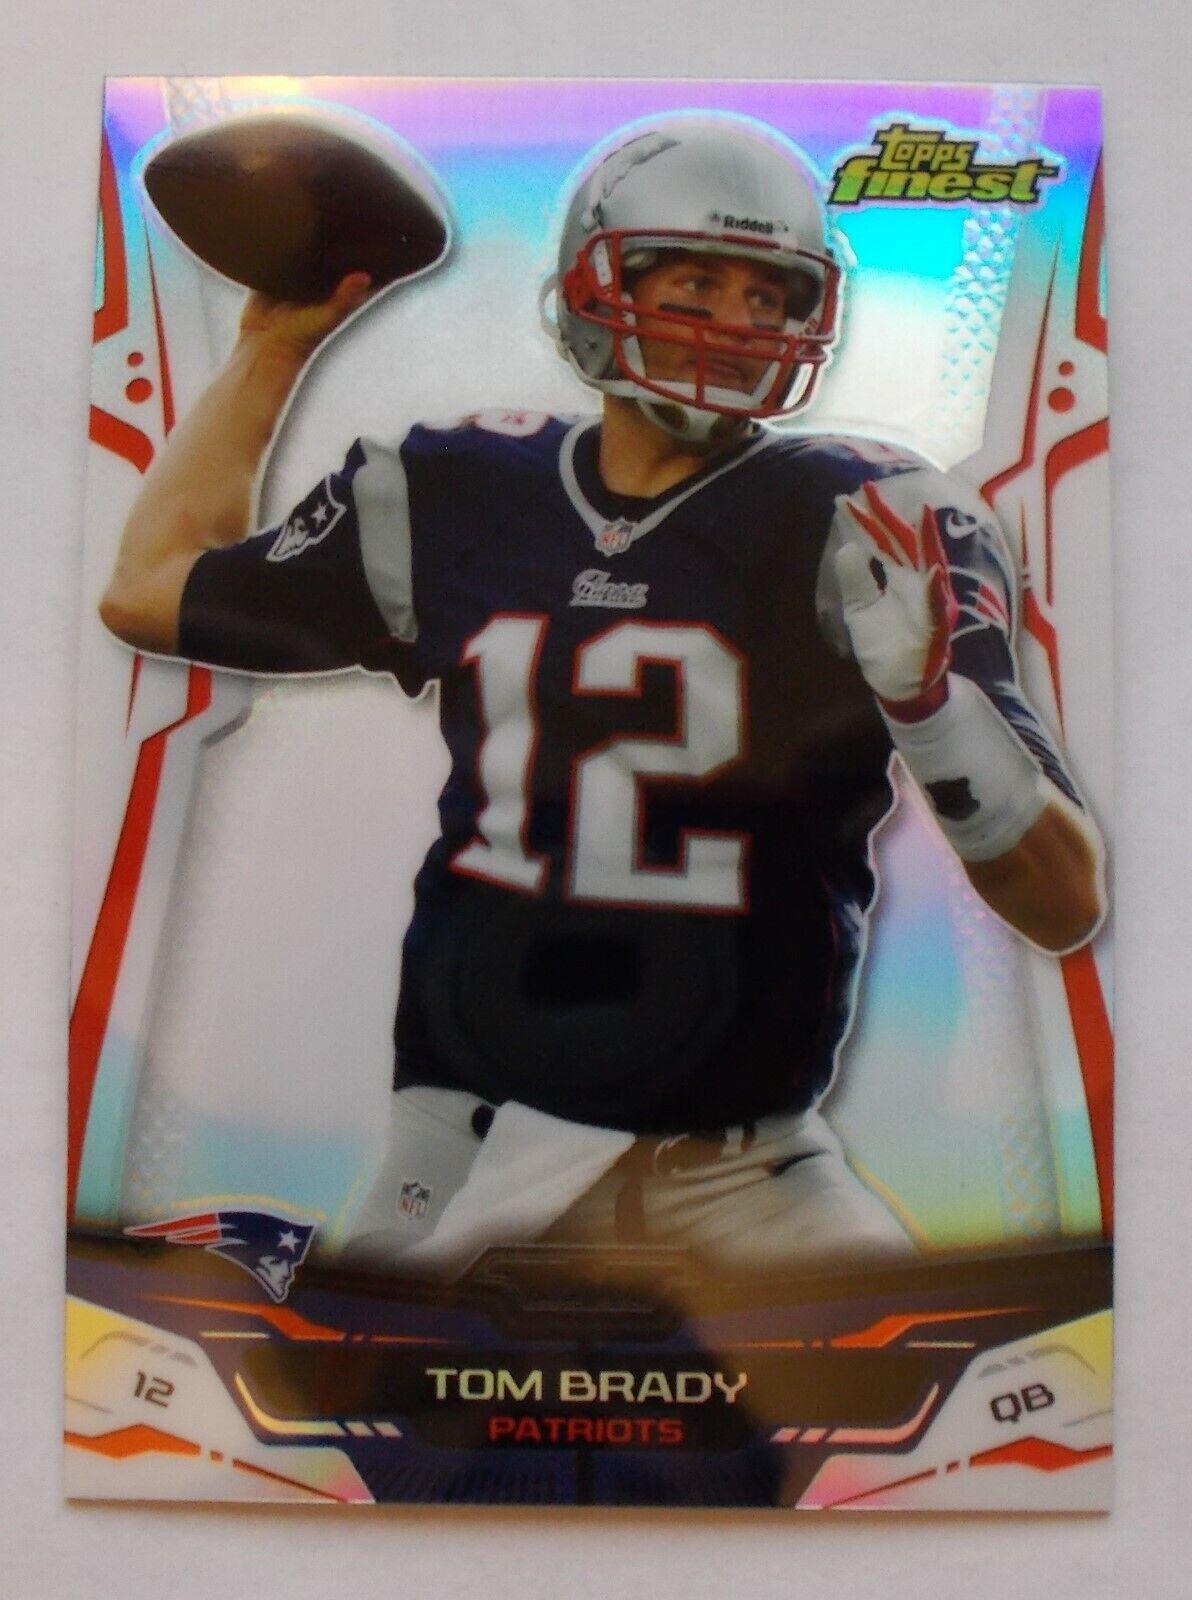 2014 Topps Finest TOM BRADY REFRACTOR Patriots - $34.99